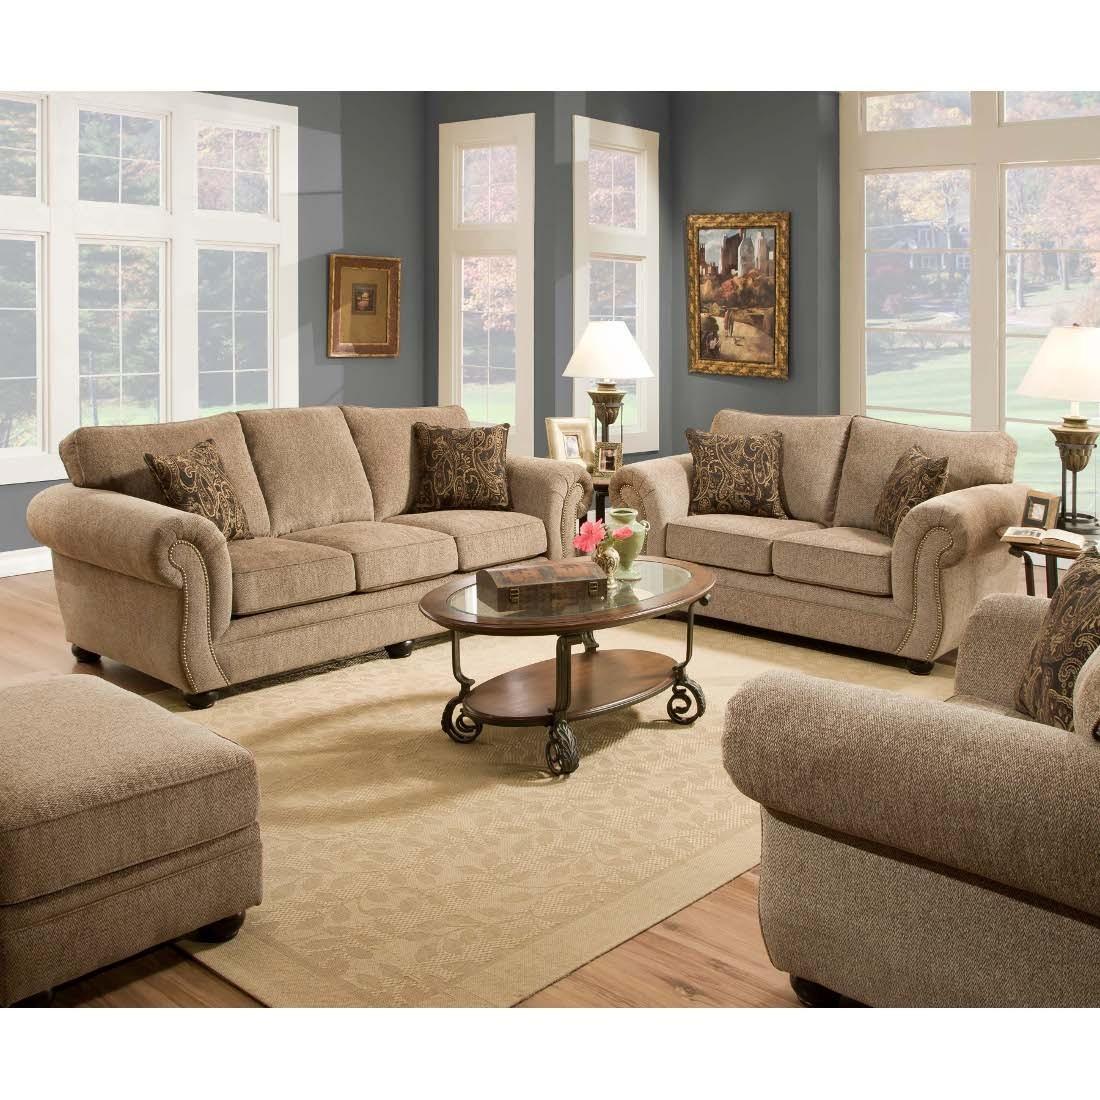 simmons bucaneer reclining sofa reviews set chairs in uganda loveseats and sofas you ll love